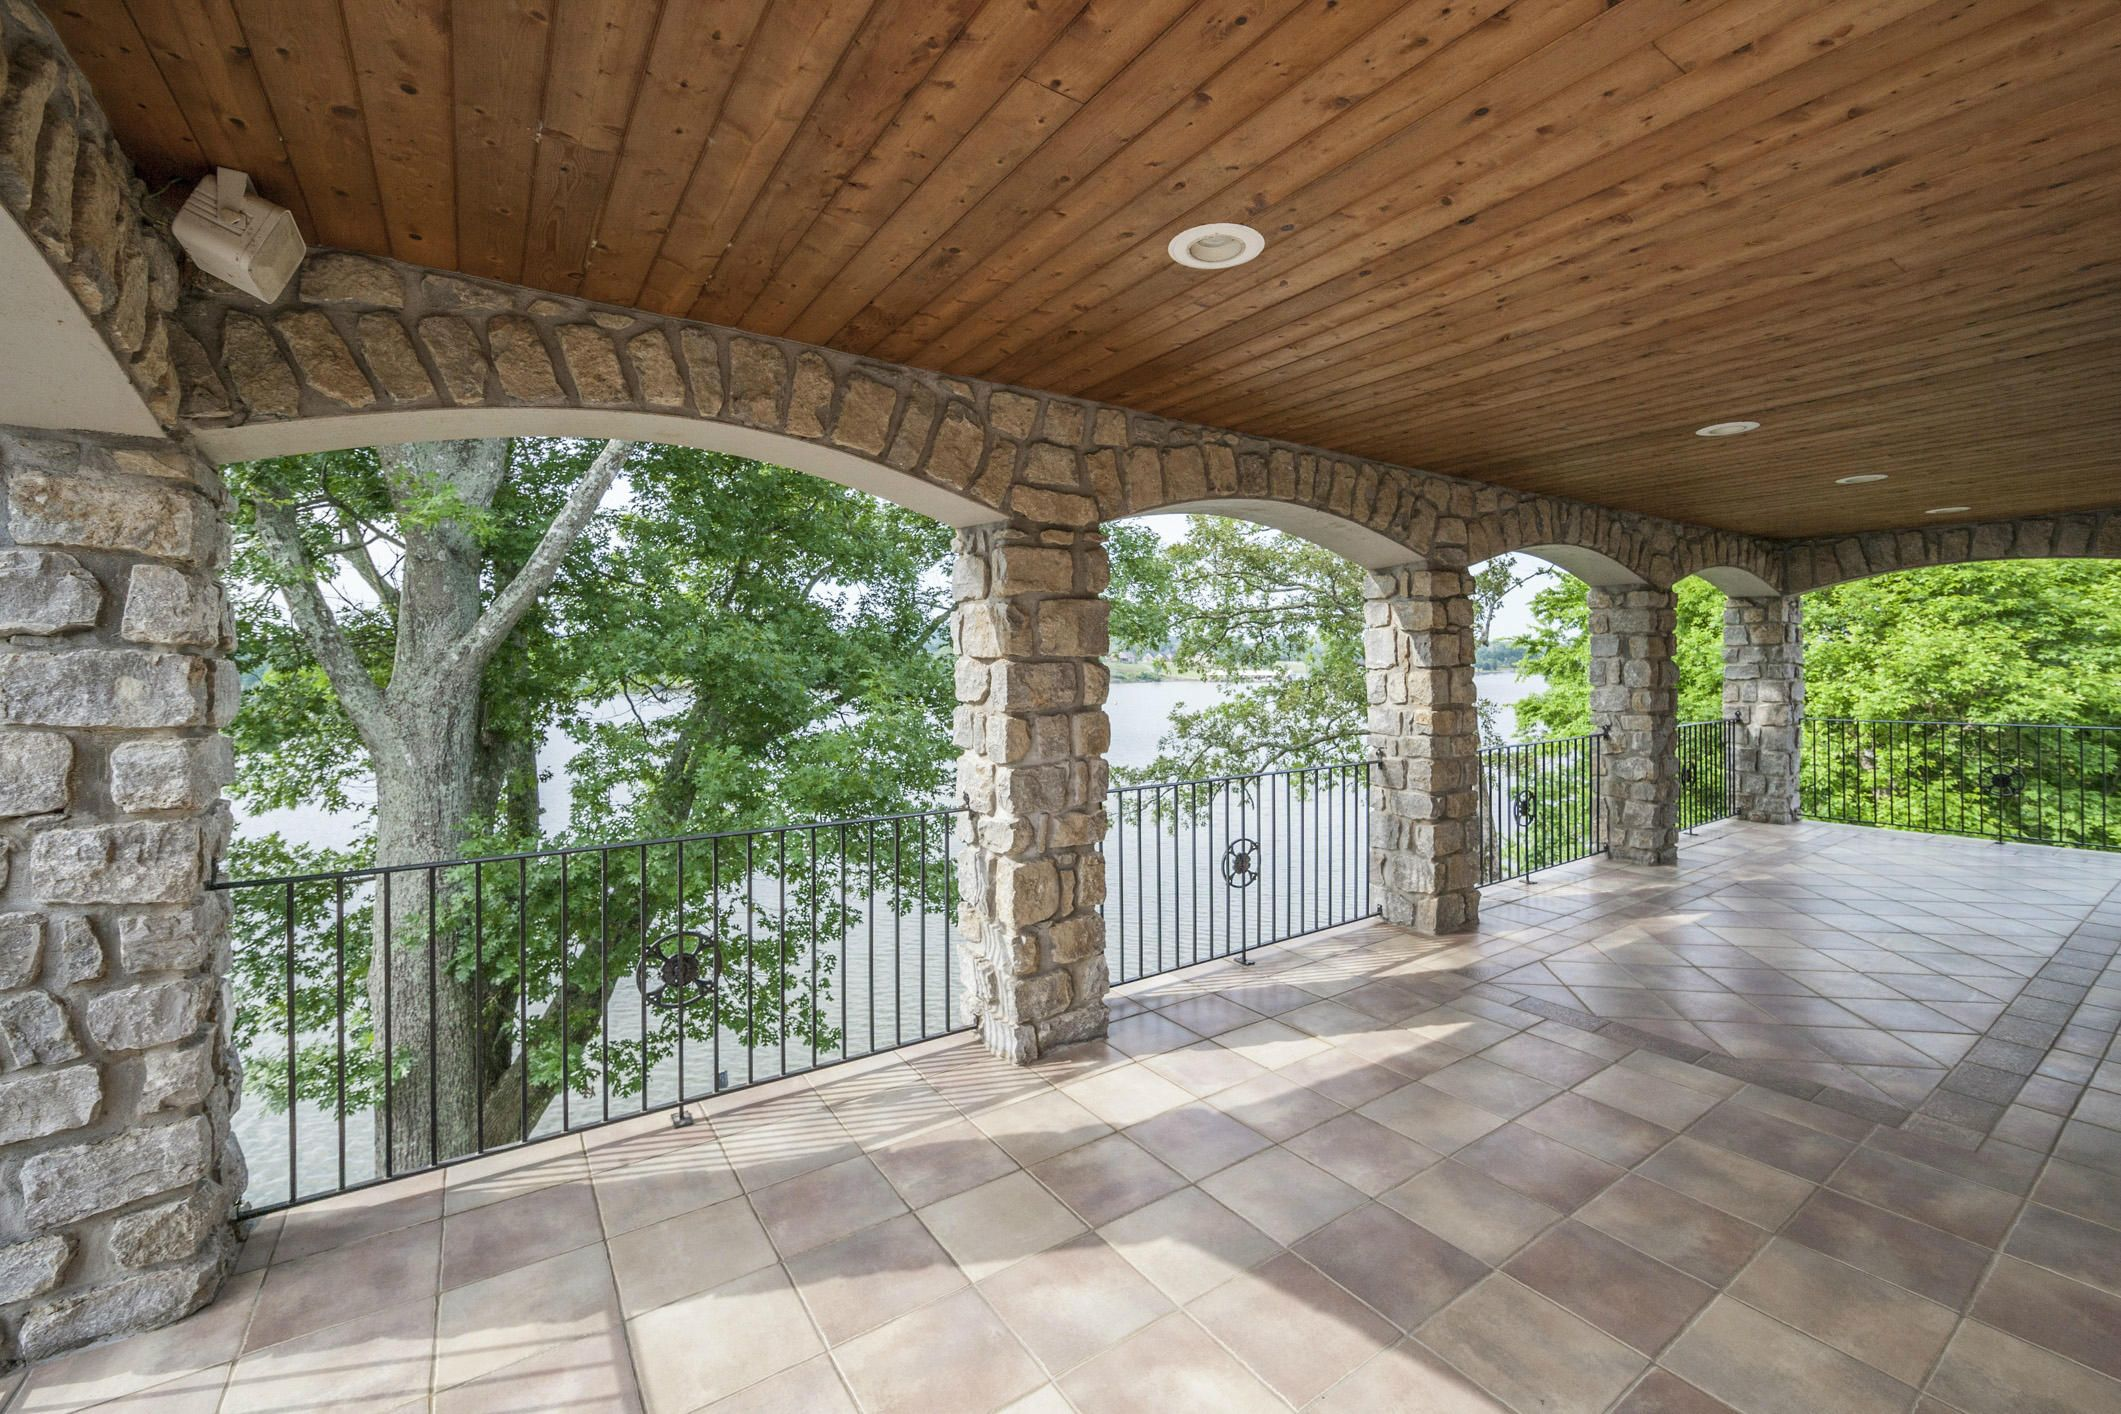 upper level porch